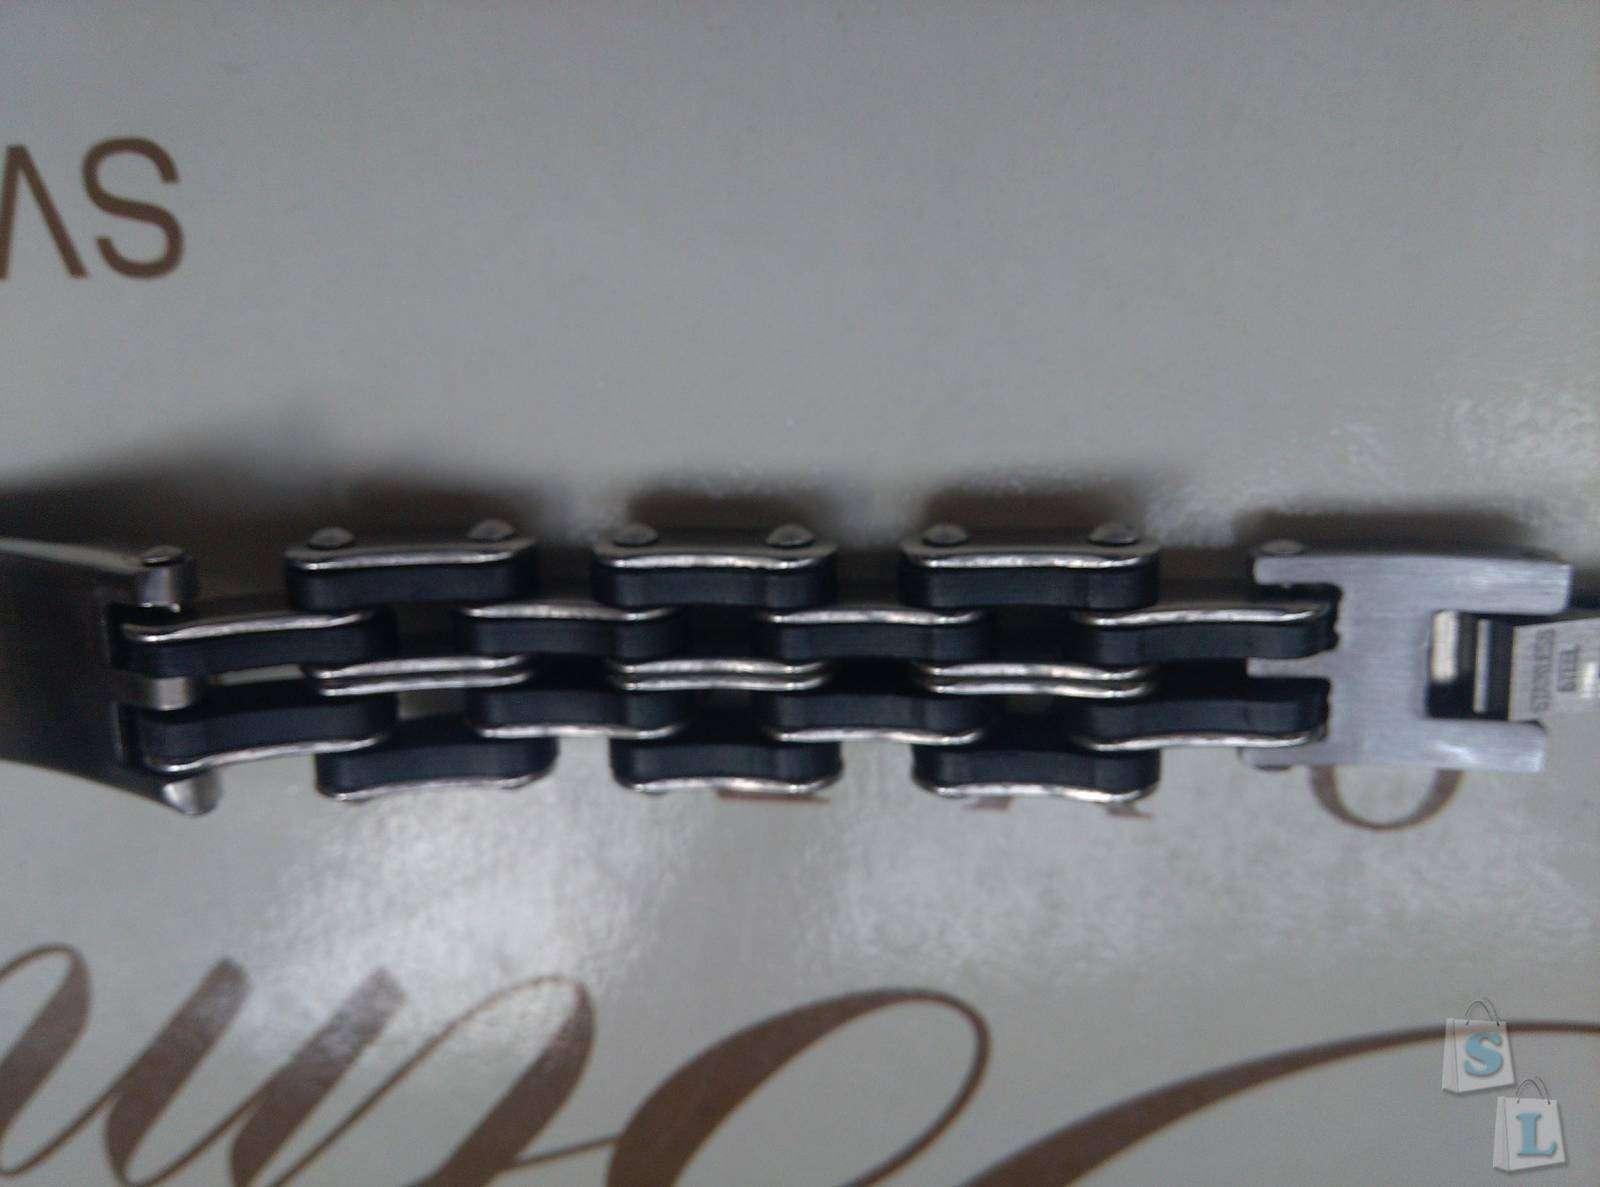 Aliexpress: Не плохой мужской браслет